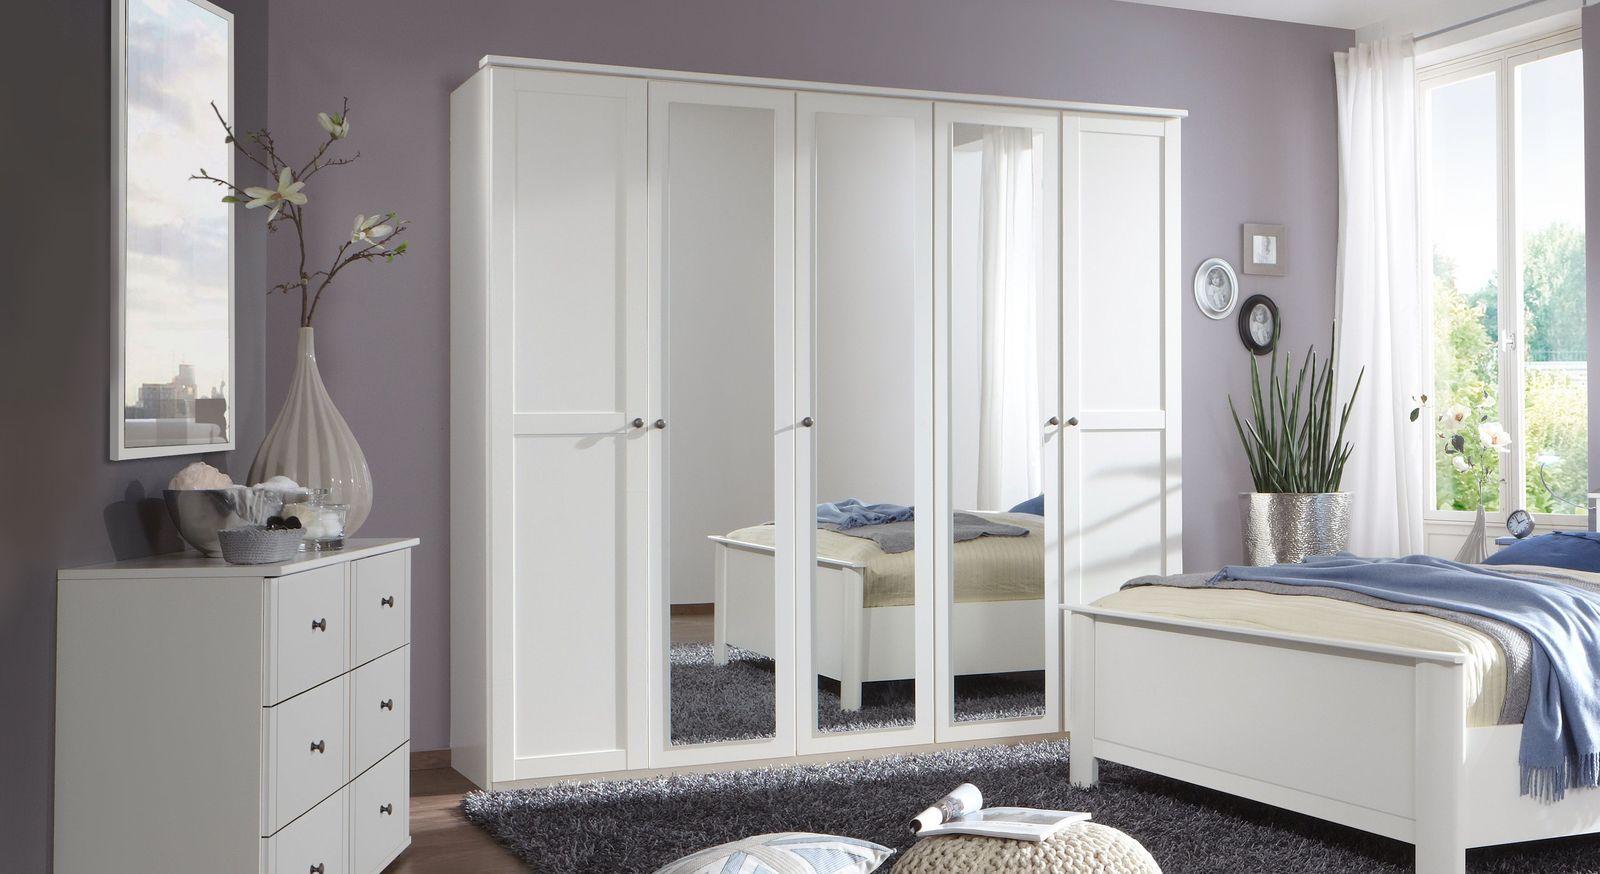 5-türiger Drehtüren-Kleiderschrank Berata